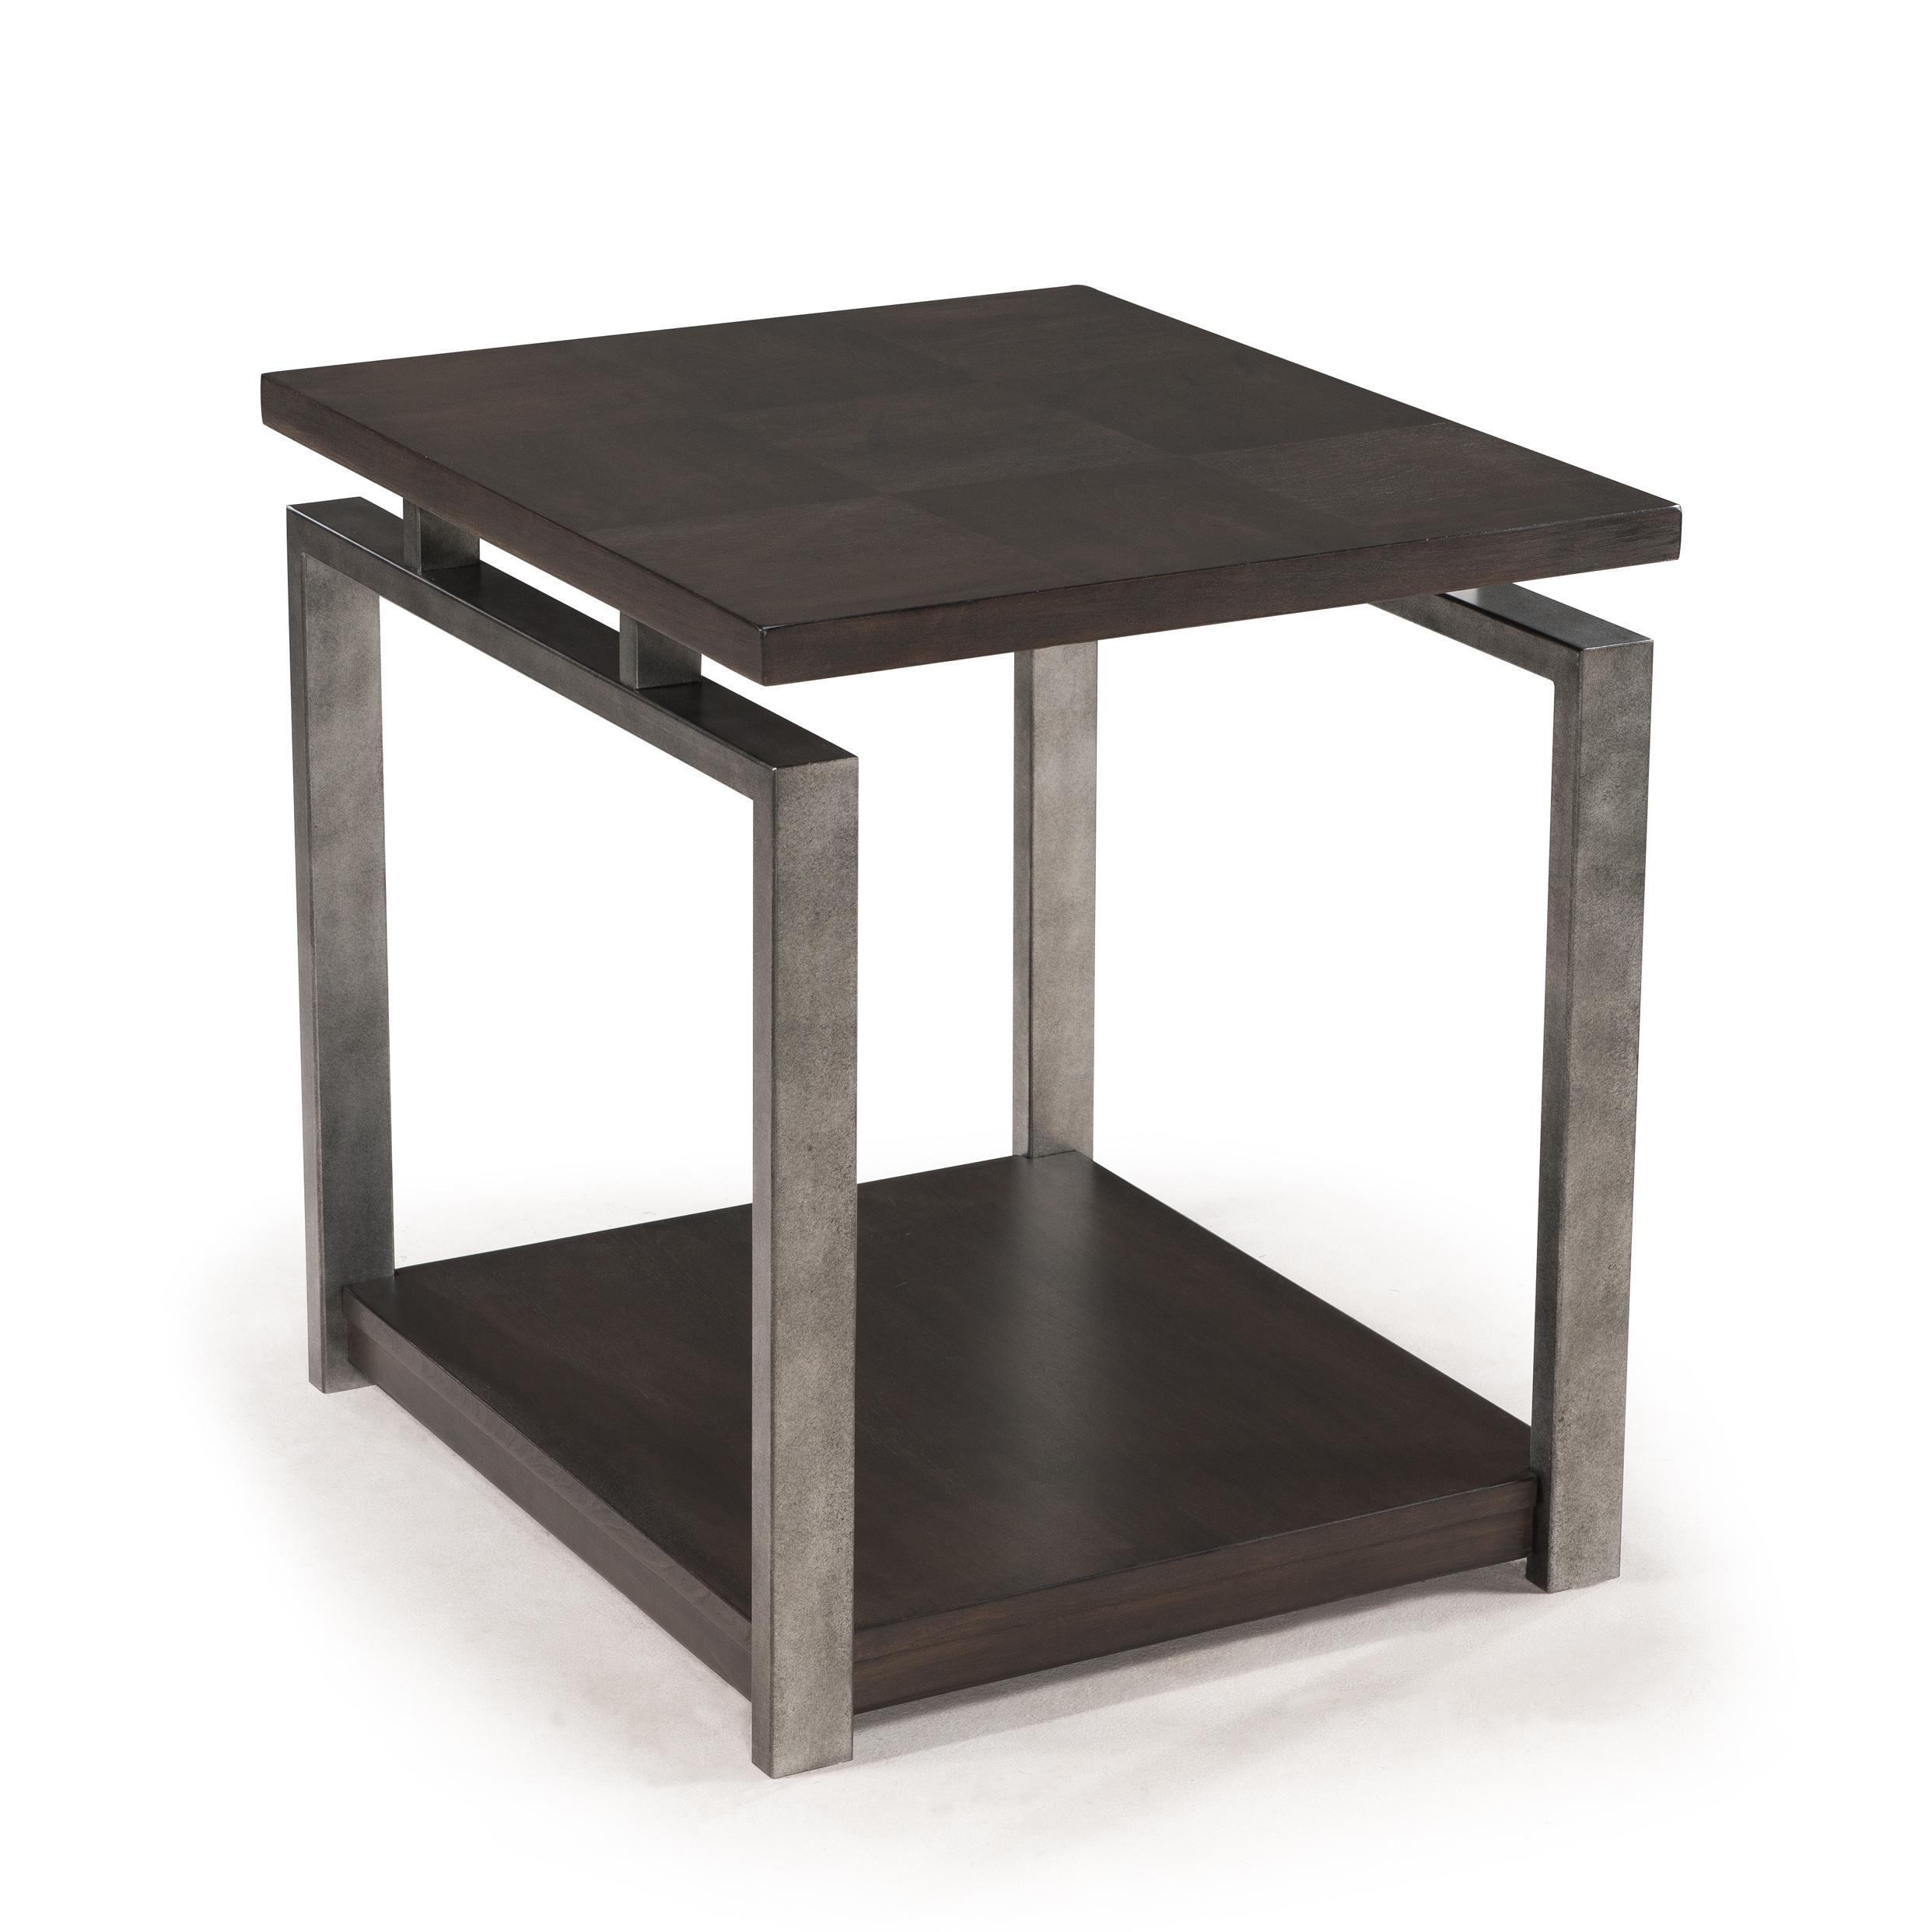 Flatstone contemporary rectangular end table morris home for Morris home